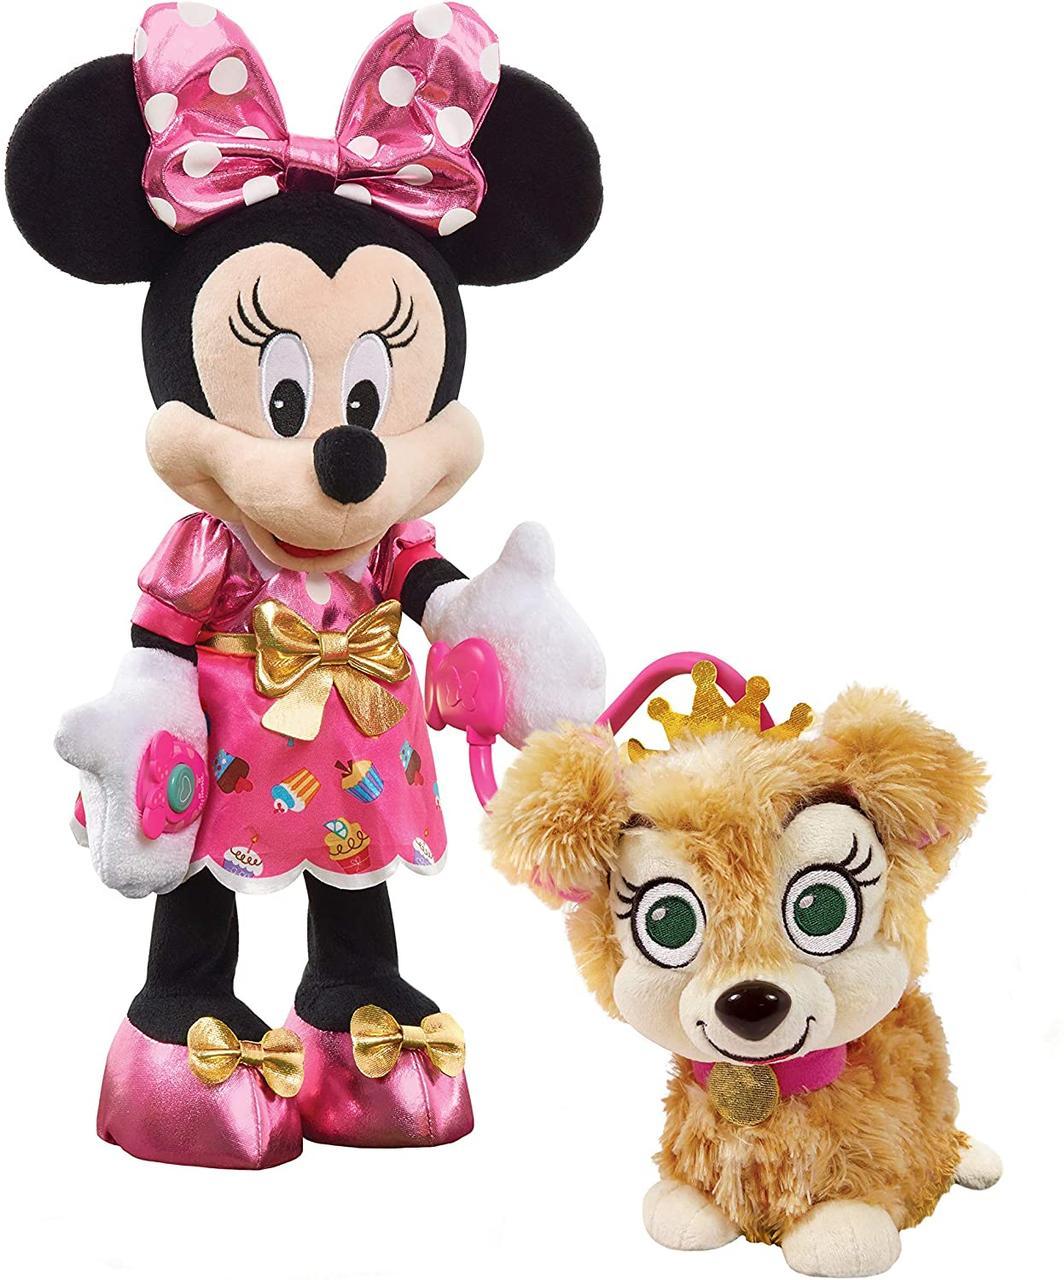 Набор Интерактивные Минни Маус и собачка Disney Junior Minnie's Party & Play Puppy Оригинал из США